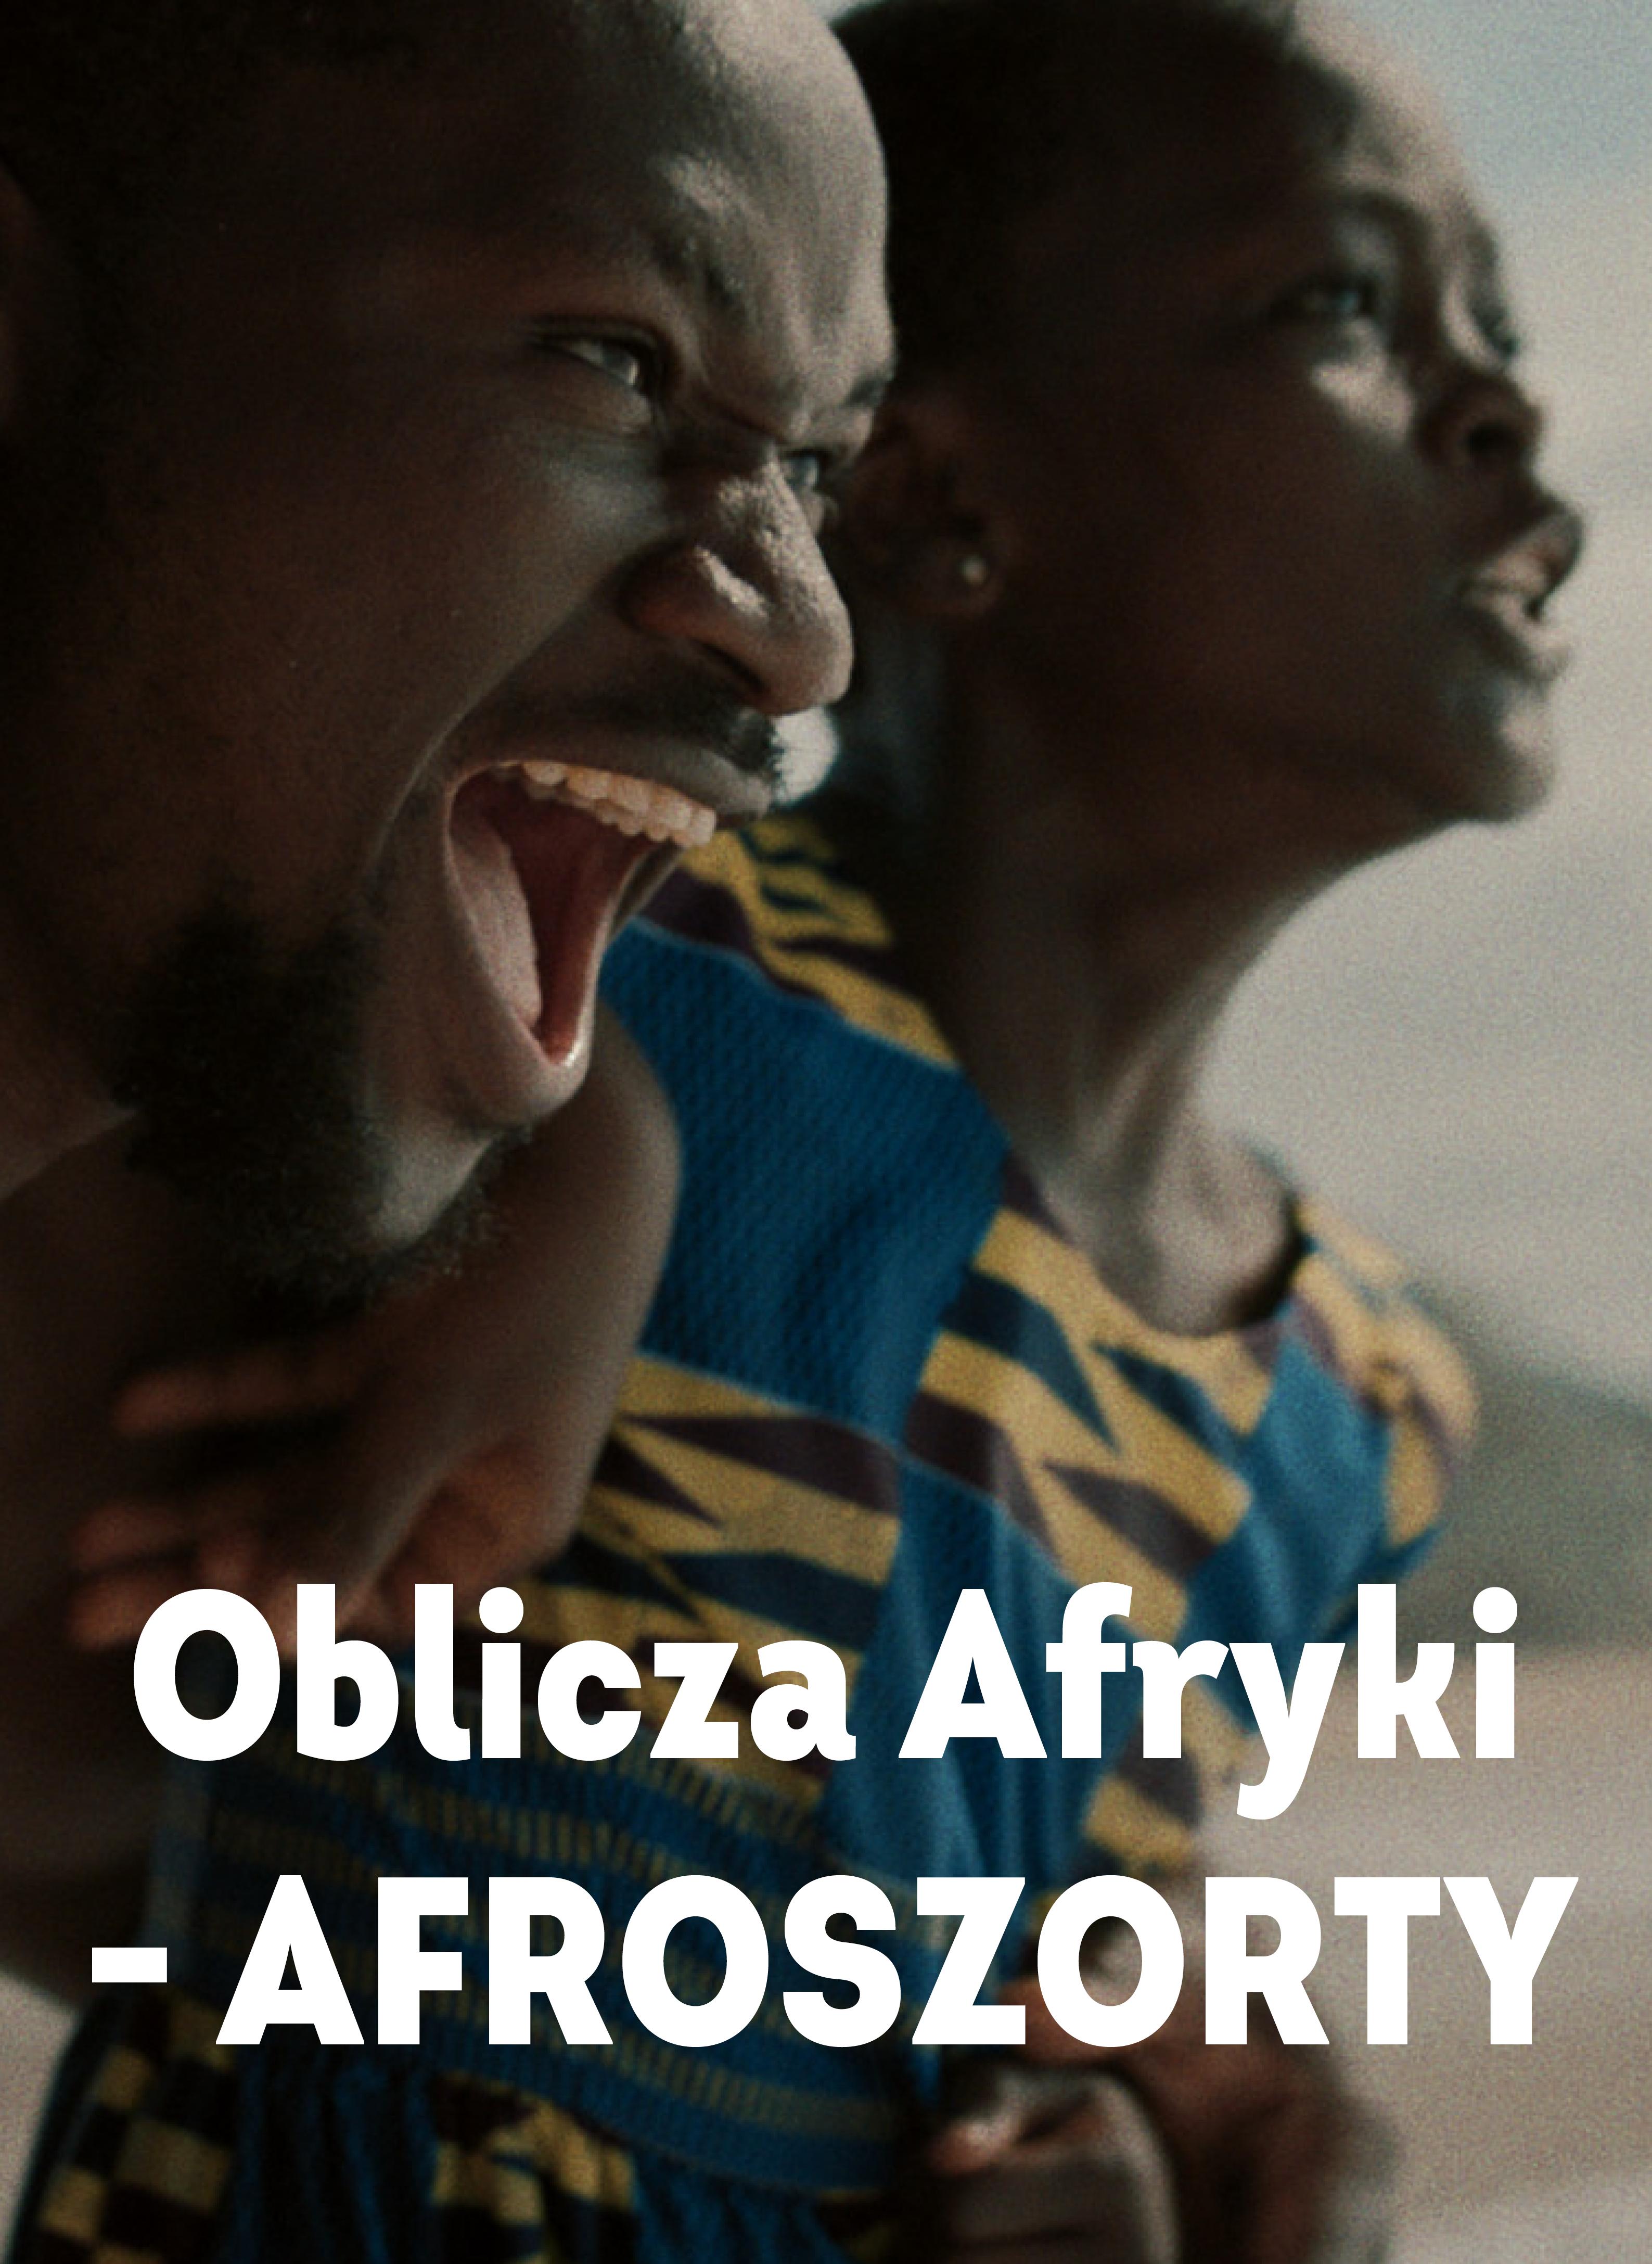 Oblicza Afryki – AFROSZORTY